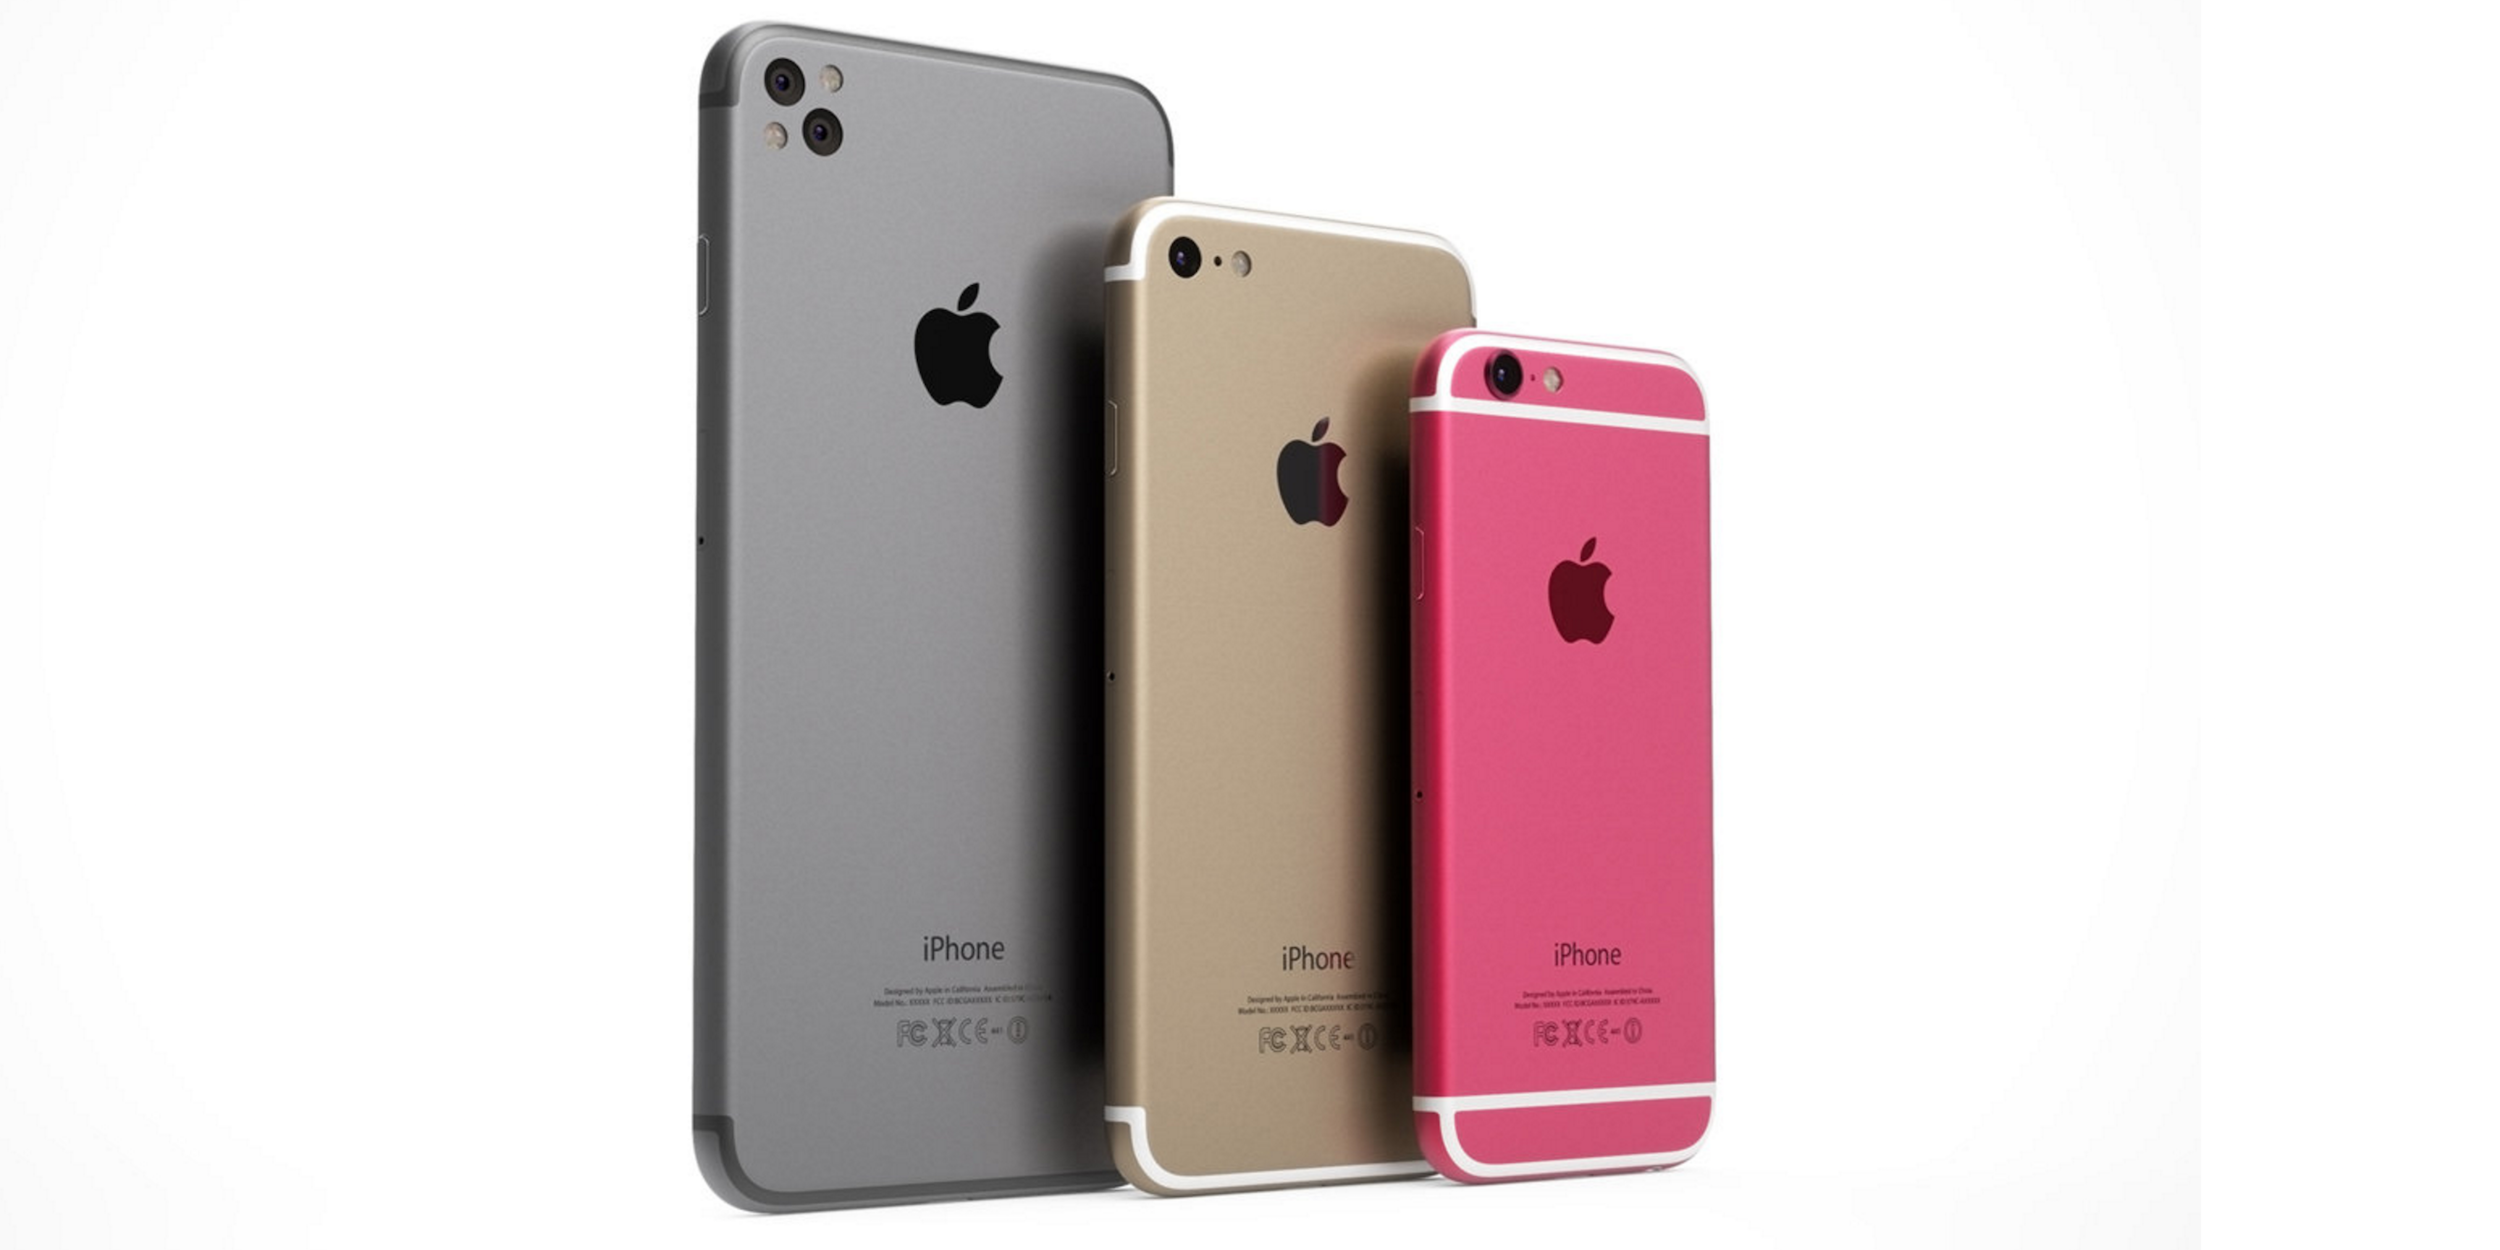 iPhone-5se-7-render